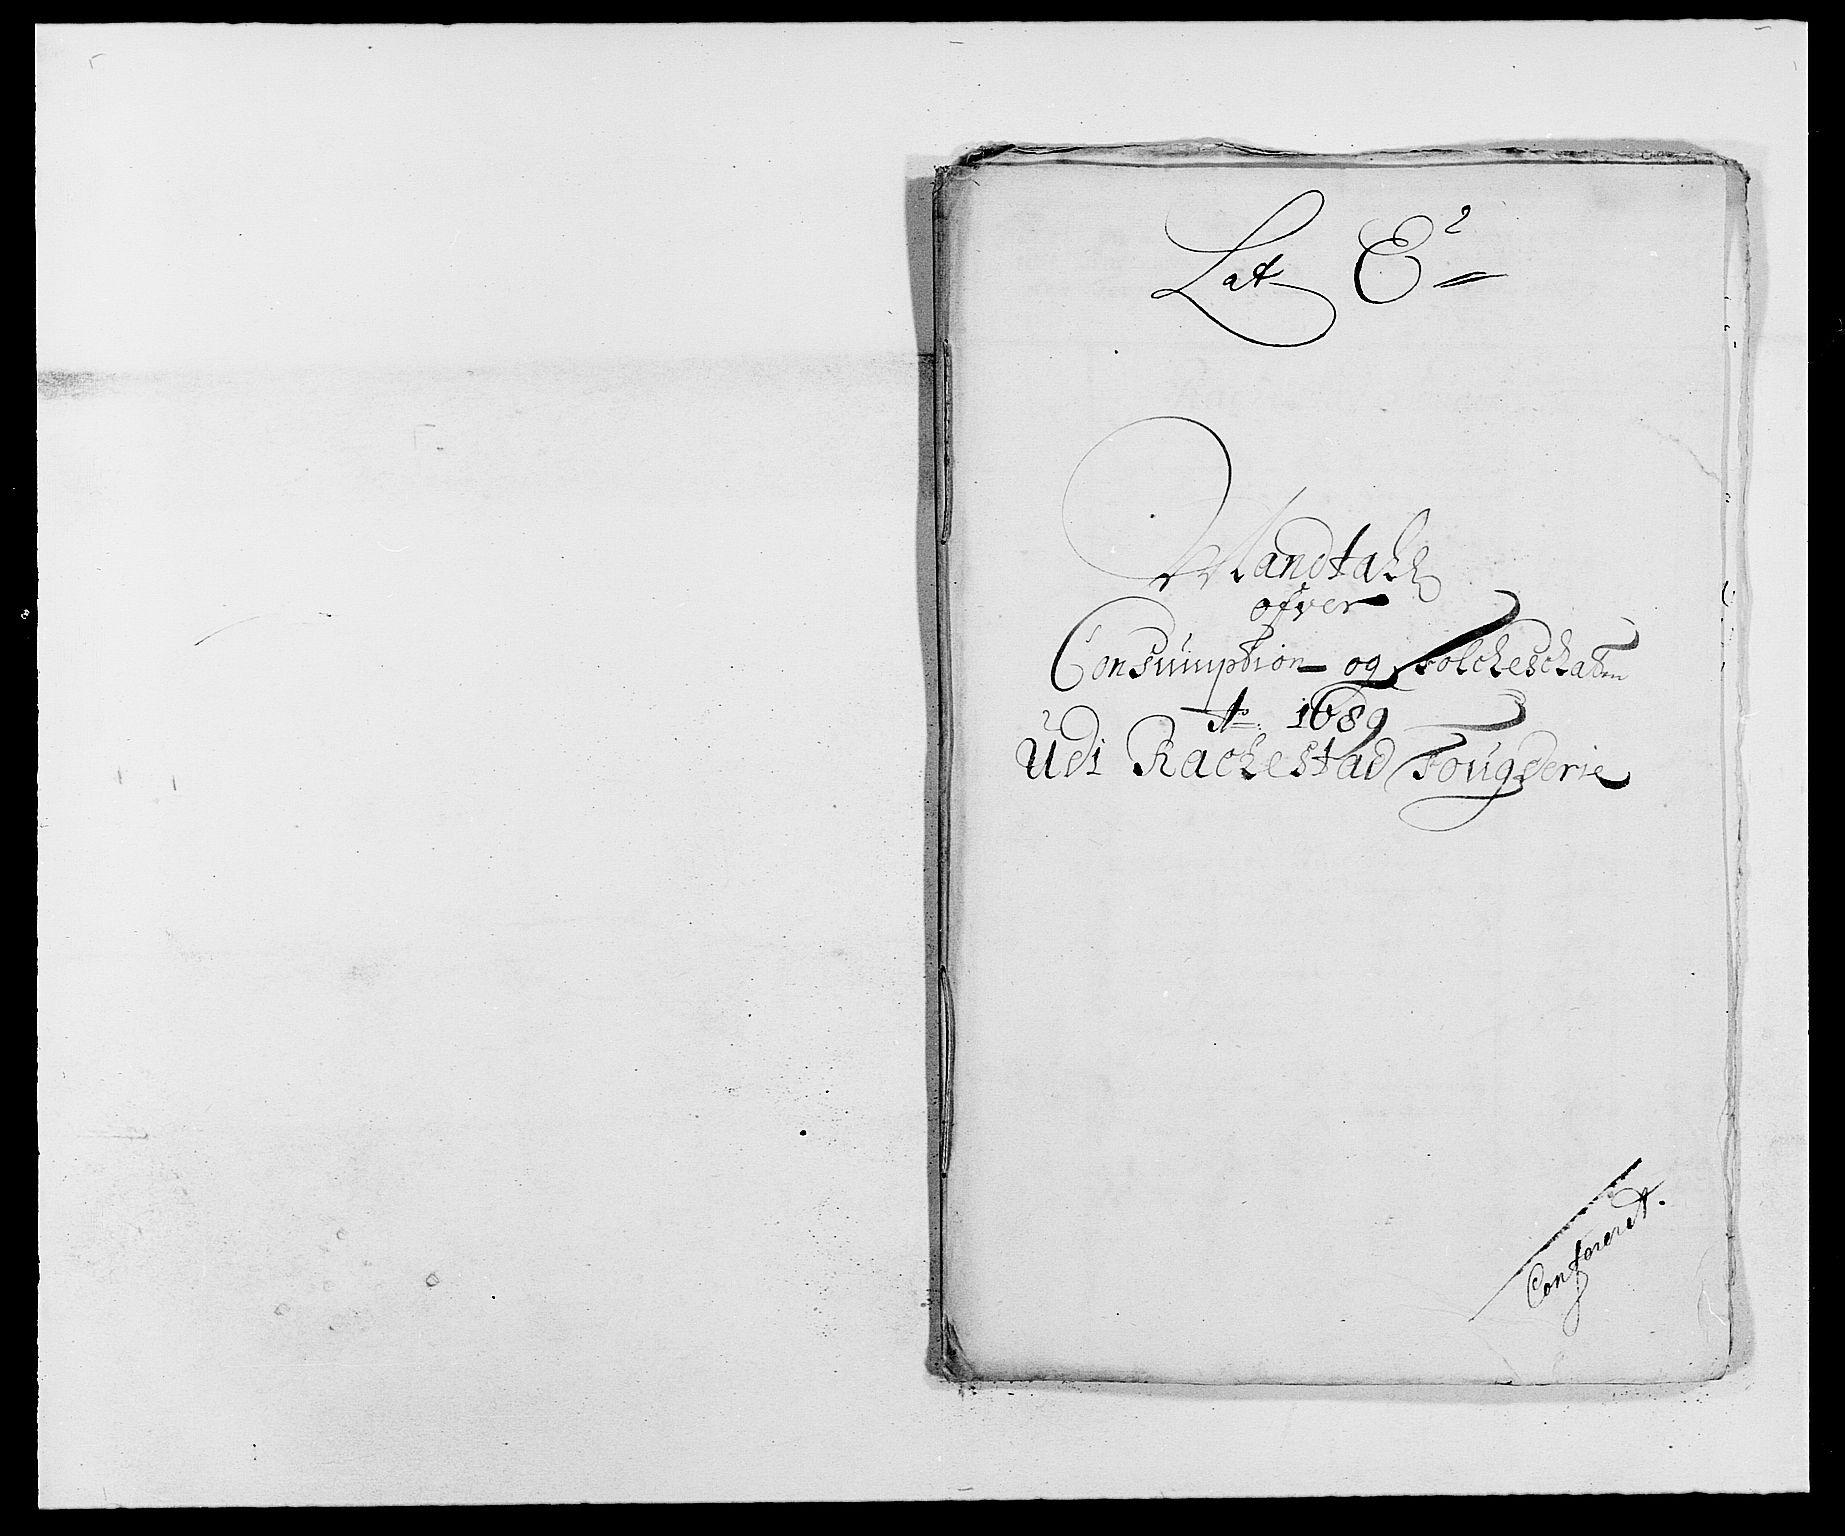 RA, Rentekammeret inntil 1814, Reviderte regnskaper, Fogderegnskap, R05/L0277: Fogderegnskap Rakkestad, 1689-1690, s. 123